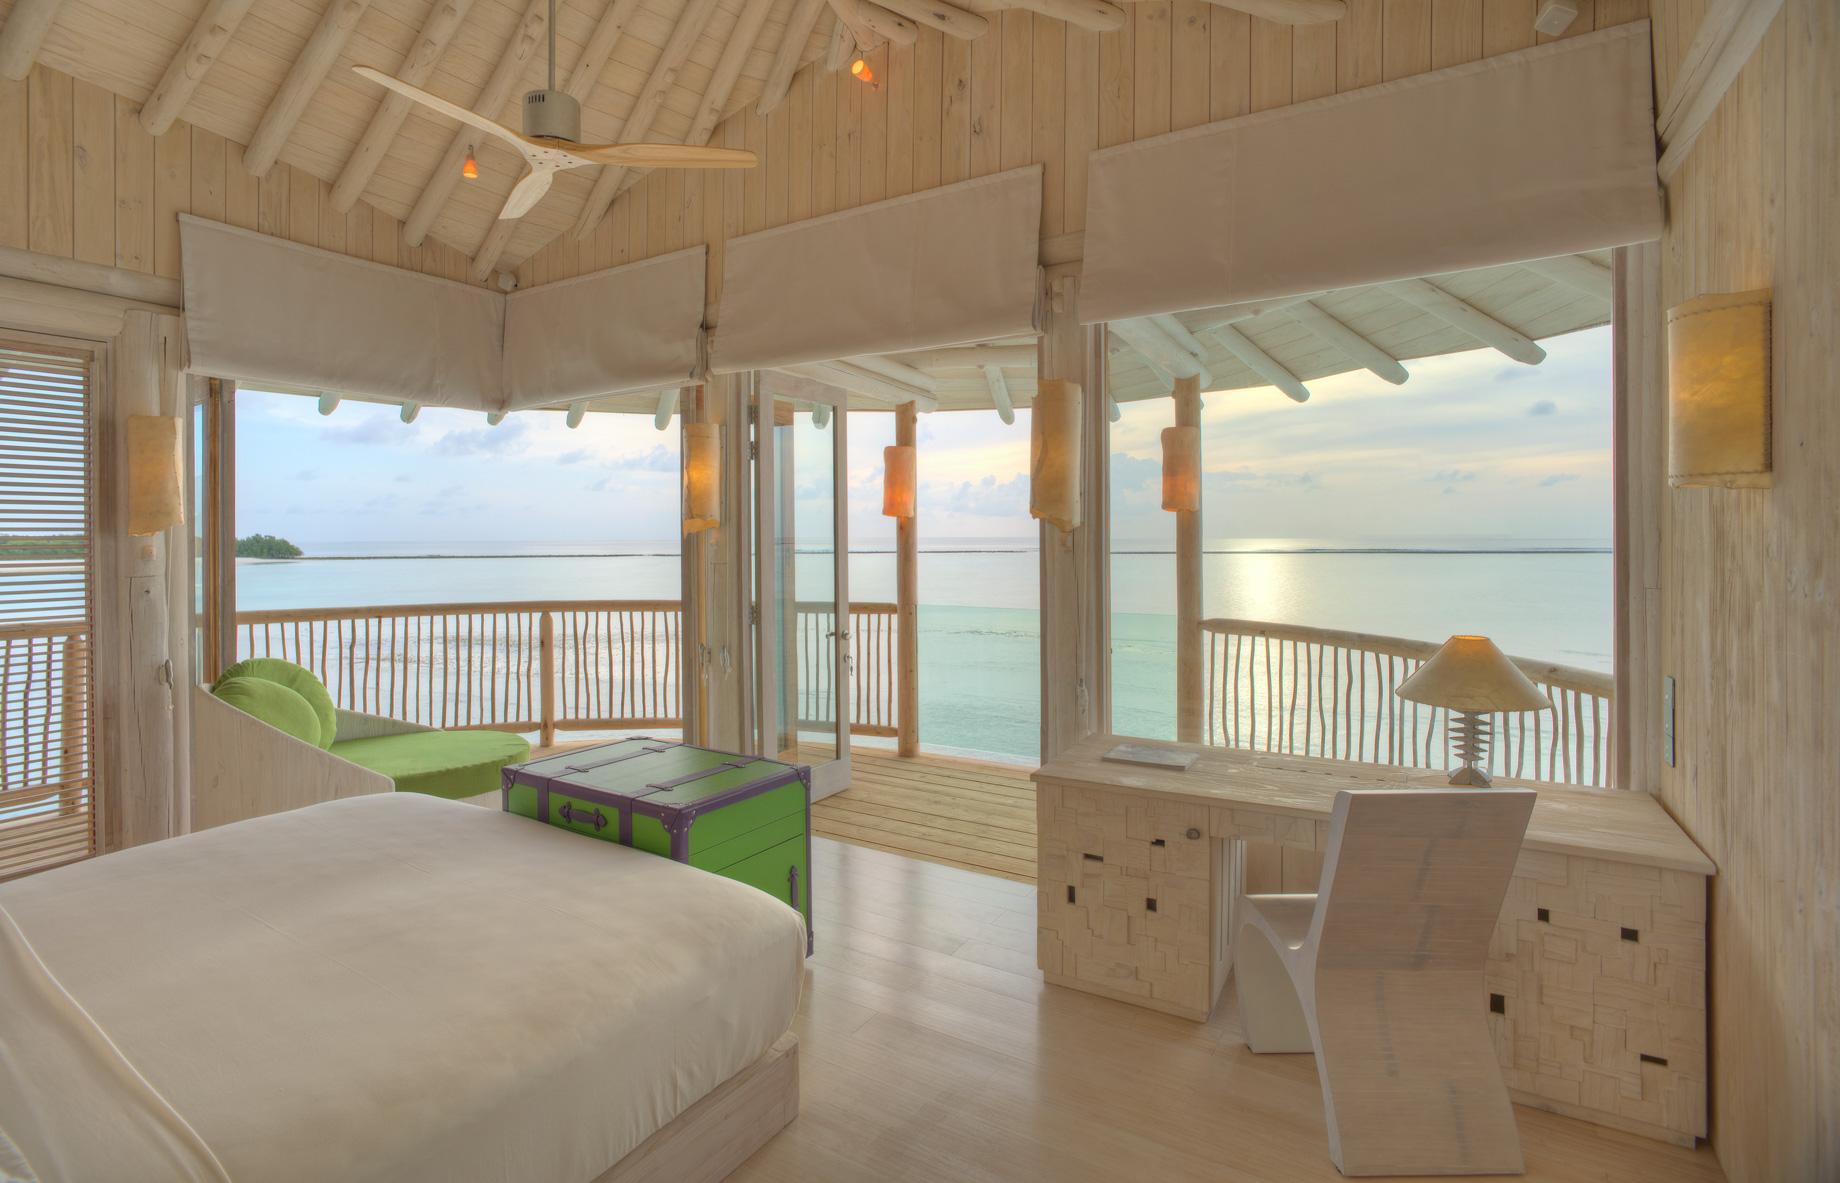 Soneva Jani Luxury Resort – Noonu Atoll, Medhufaru, Maldives – 2 Bedroom Water Retreat Villa Bedroom View Dusk